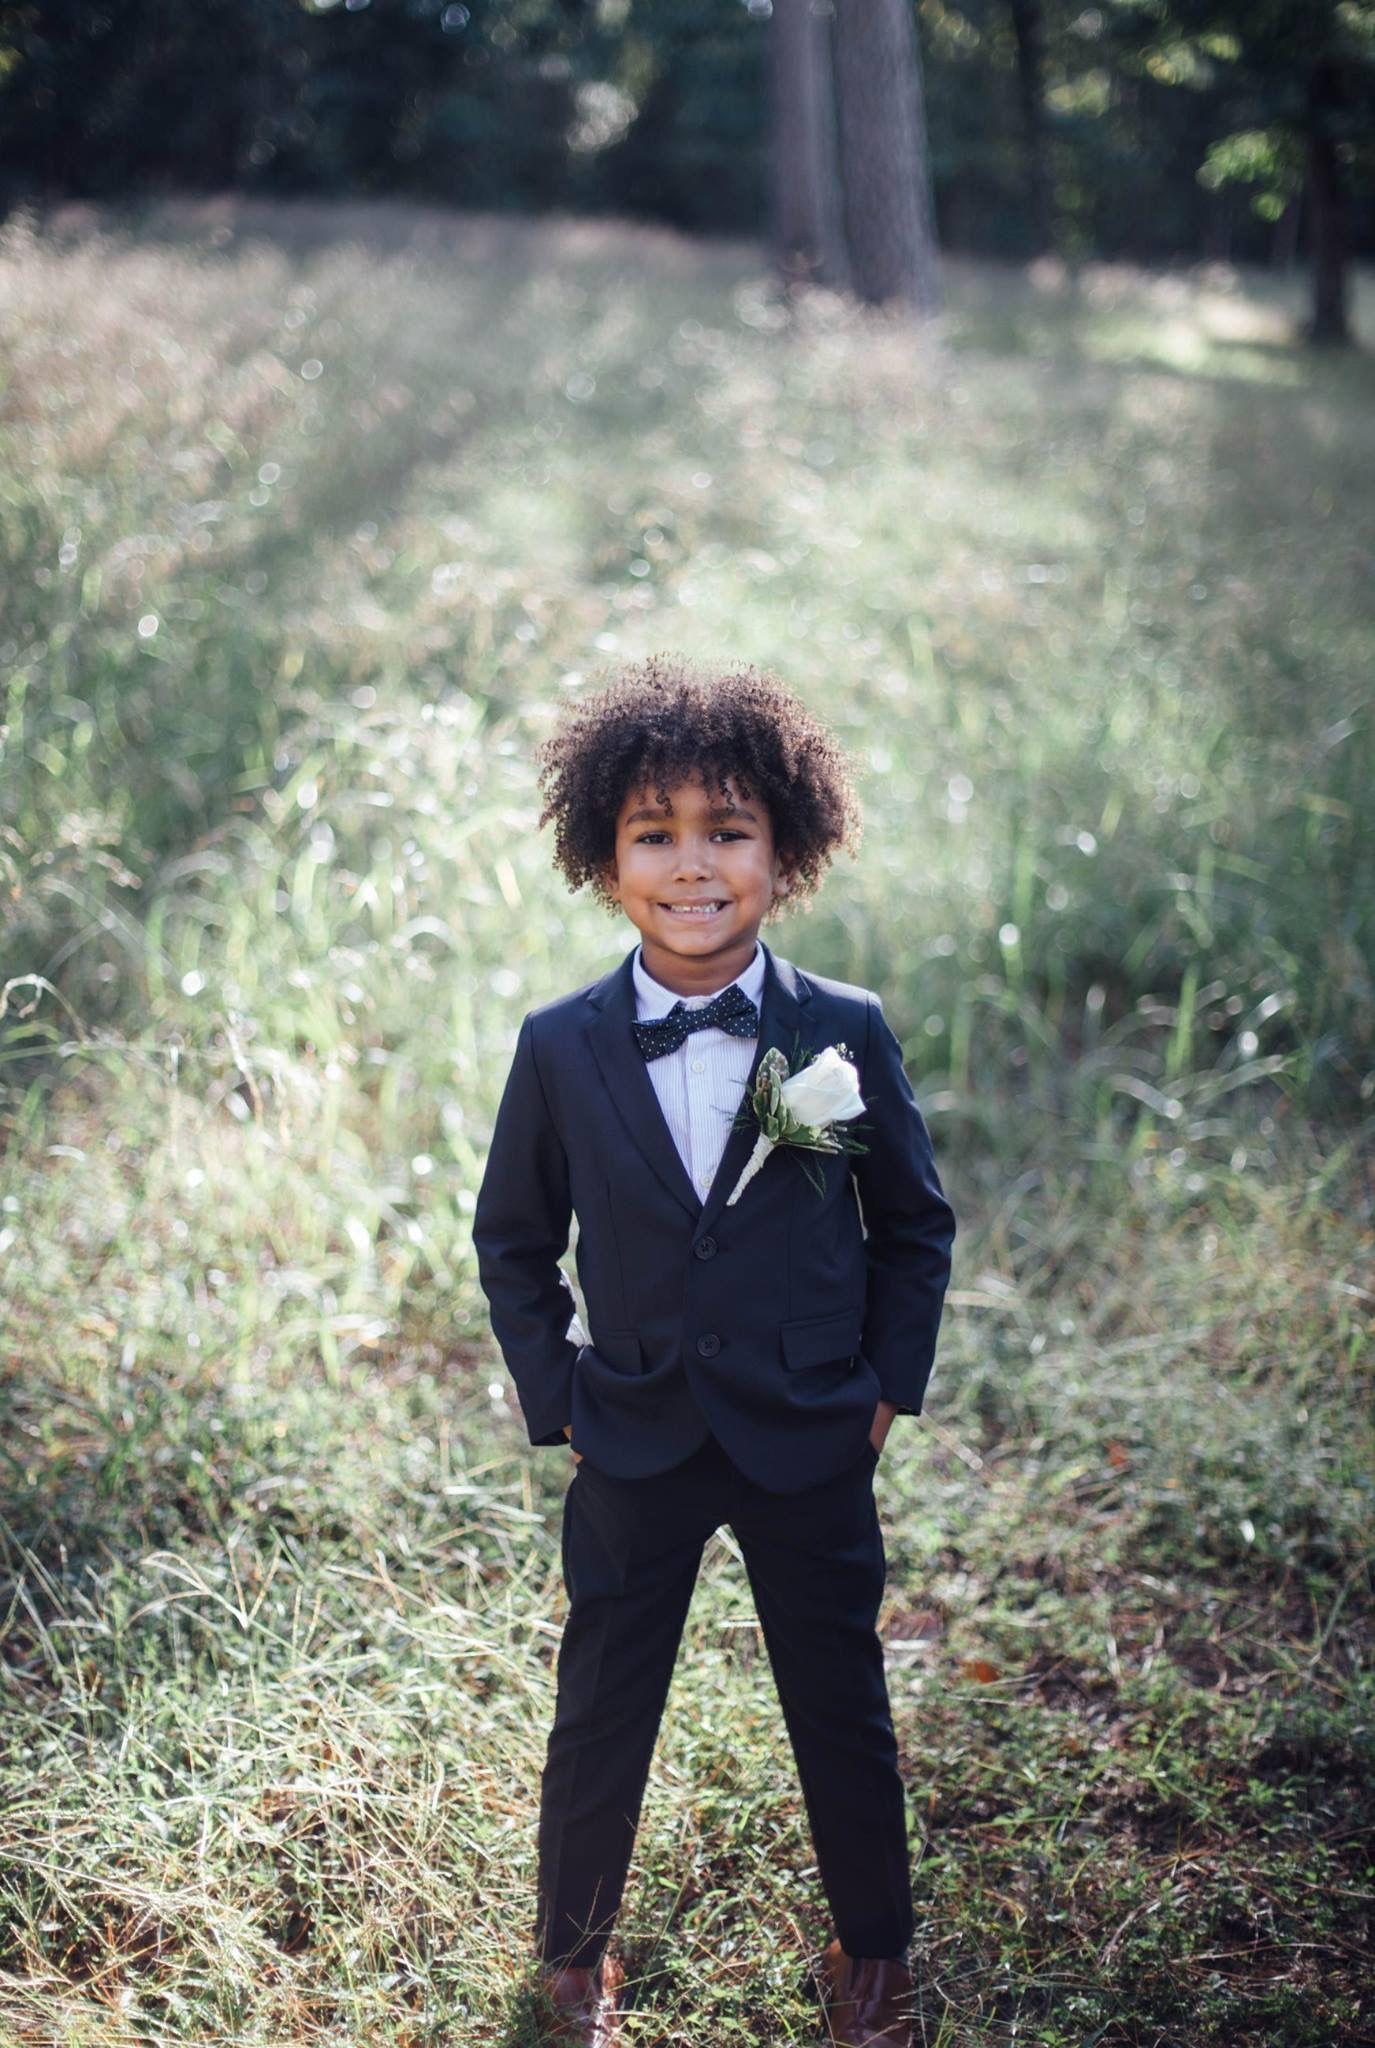 Toddler Dress Up Mock Wedding Breana Marie Photography   Breana ...